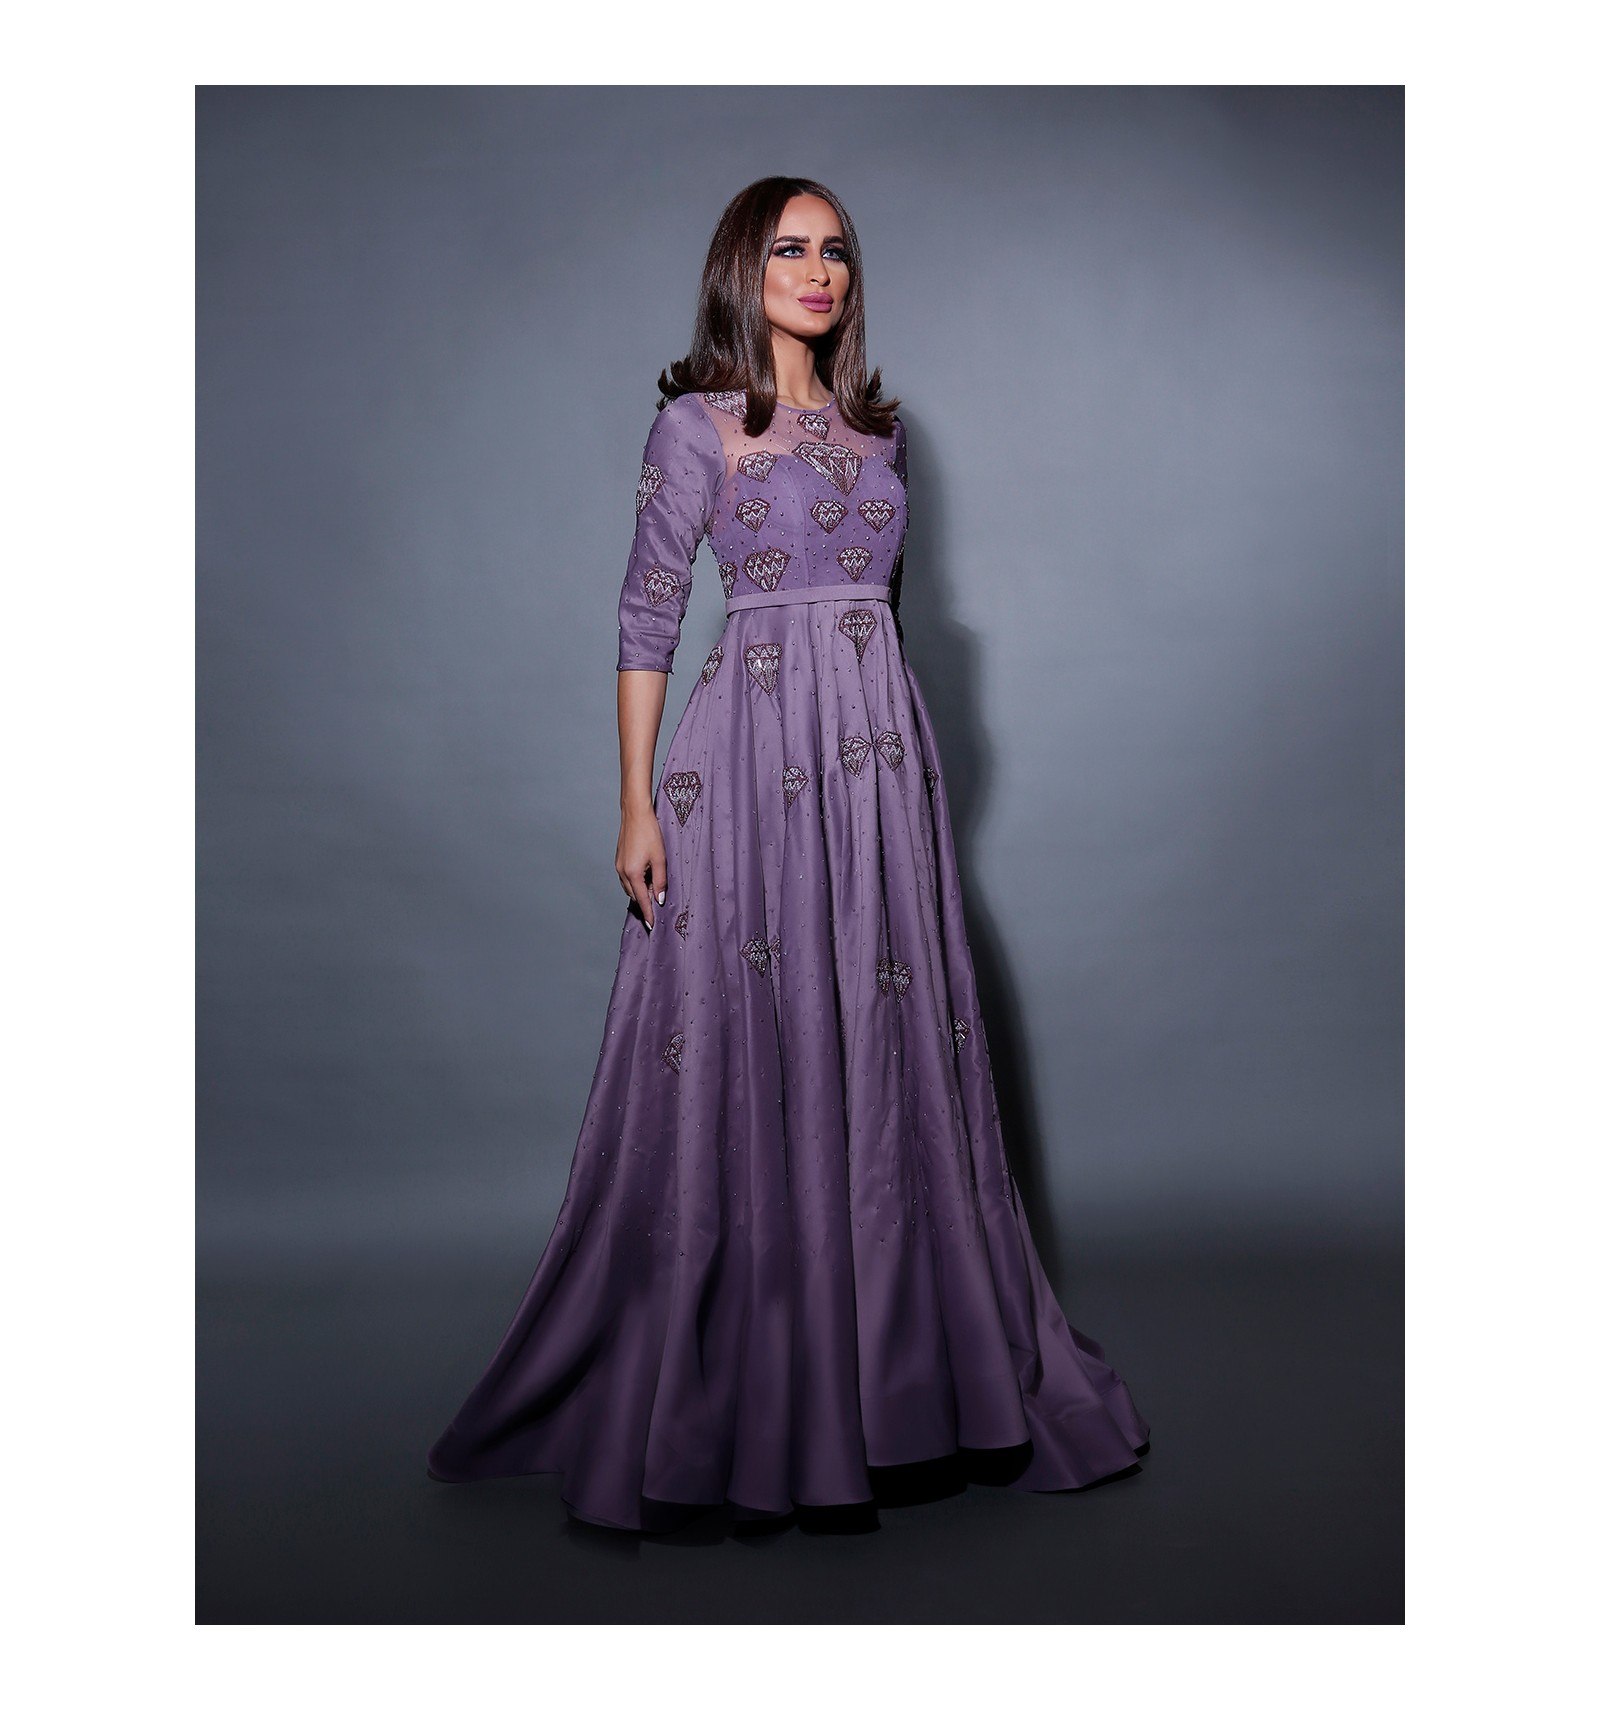 بالصور فساتين كلوش , اروع واجمل موديلات فستان للبنات واسع 1221 2